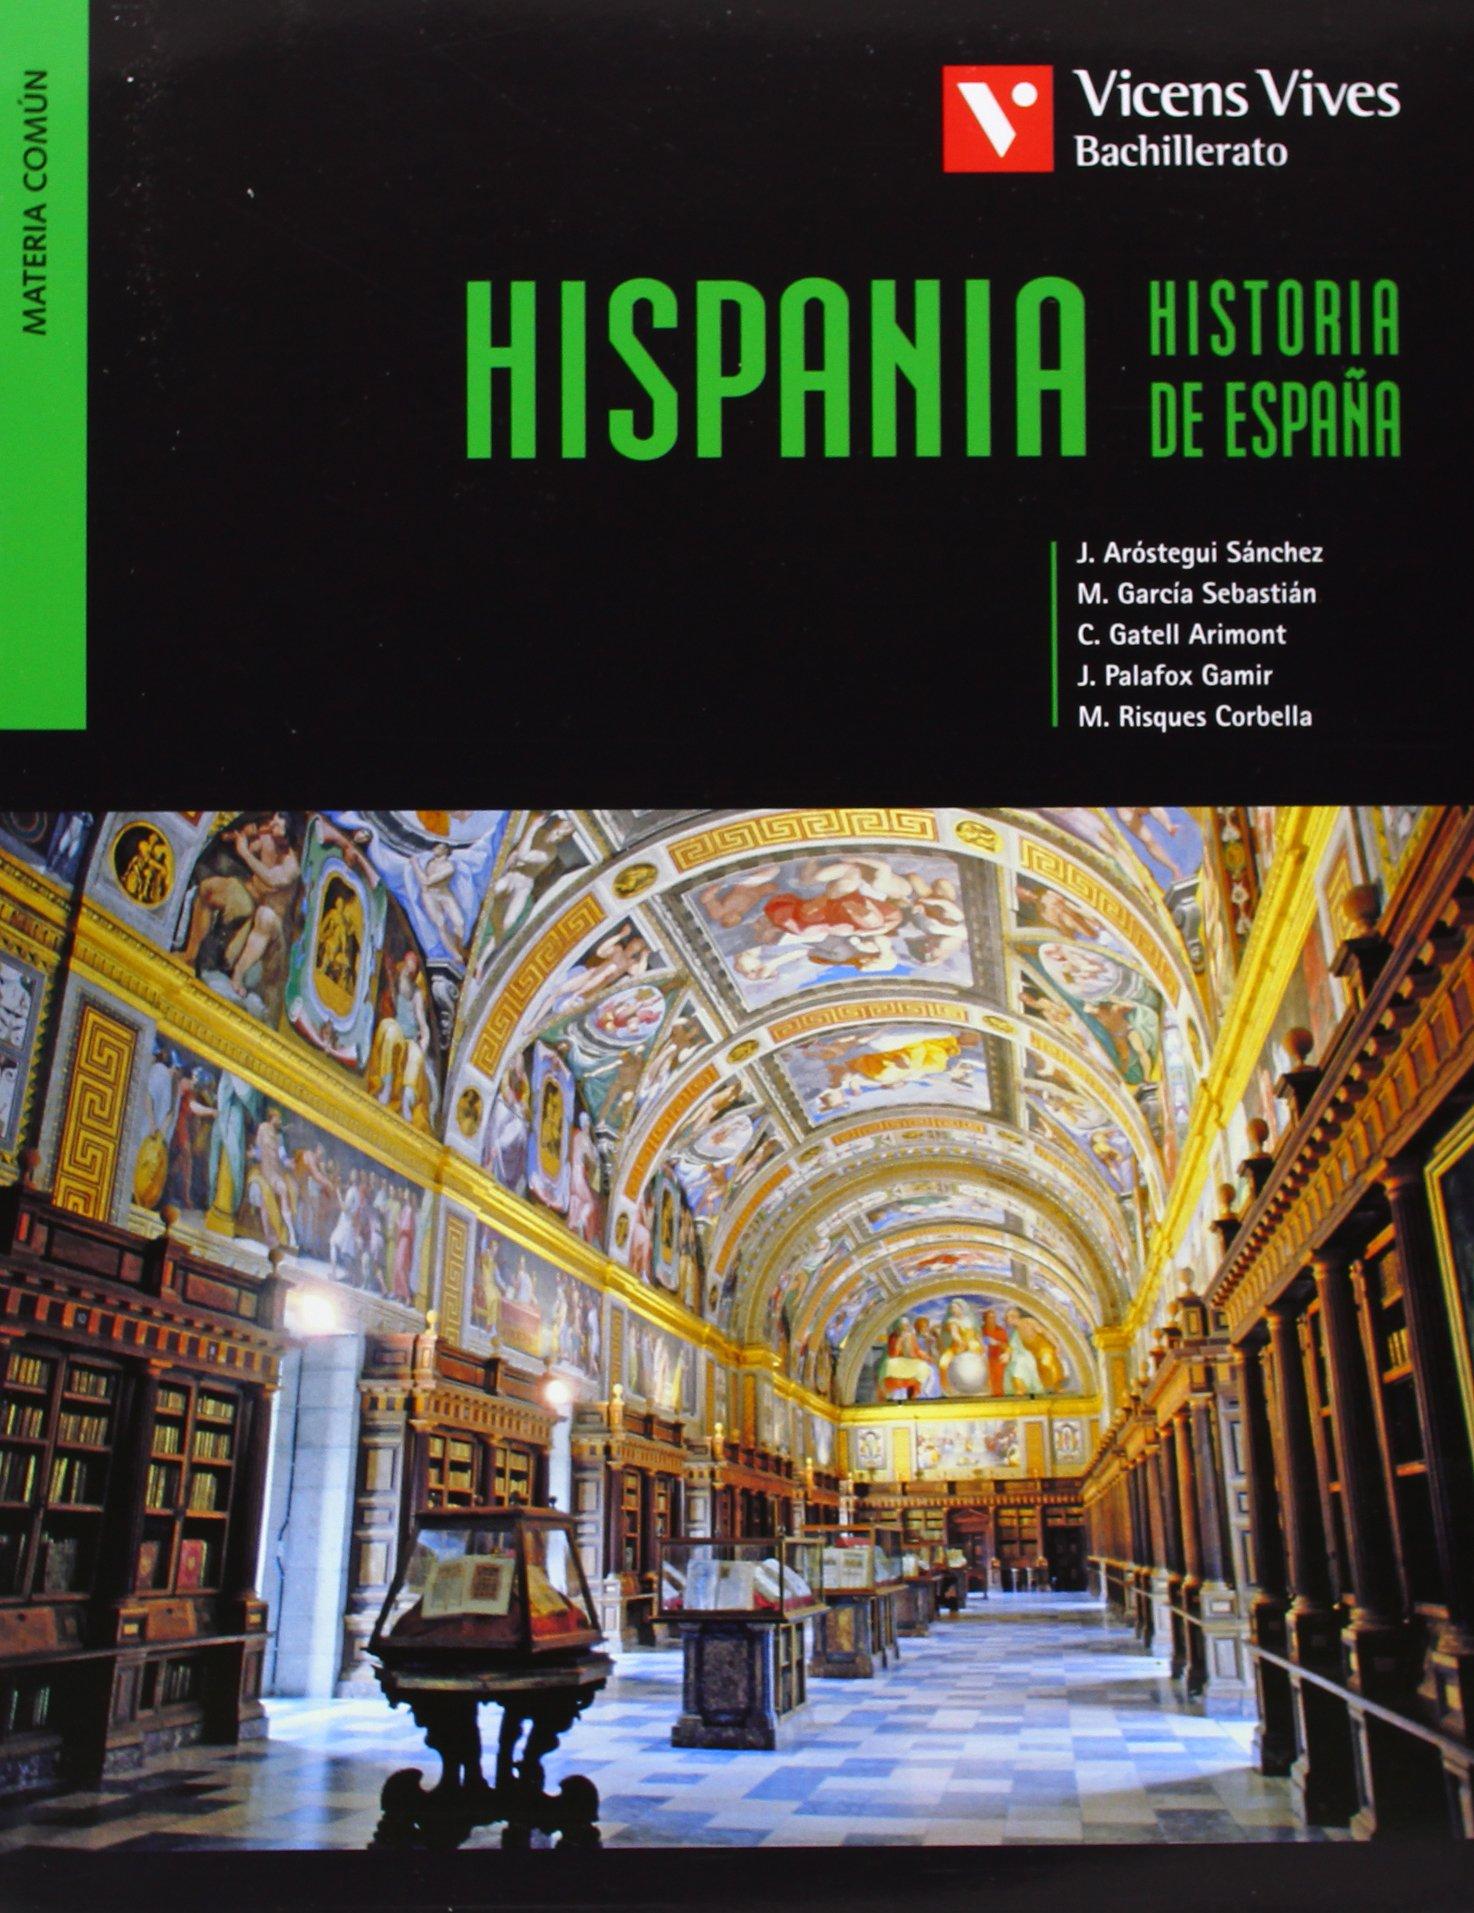 Hispania+historia Cast Y Leon Sep Bach - 9788431698621: Amazon.es: Gatell Arimont, Cristina: Libros